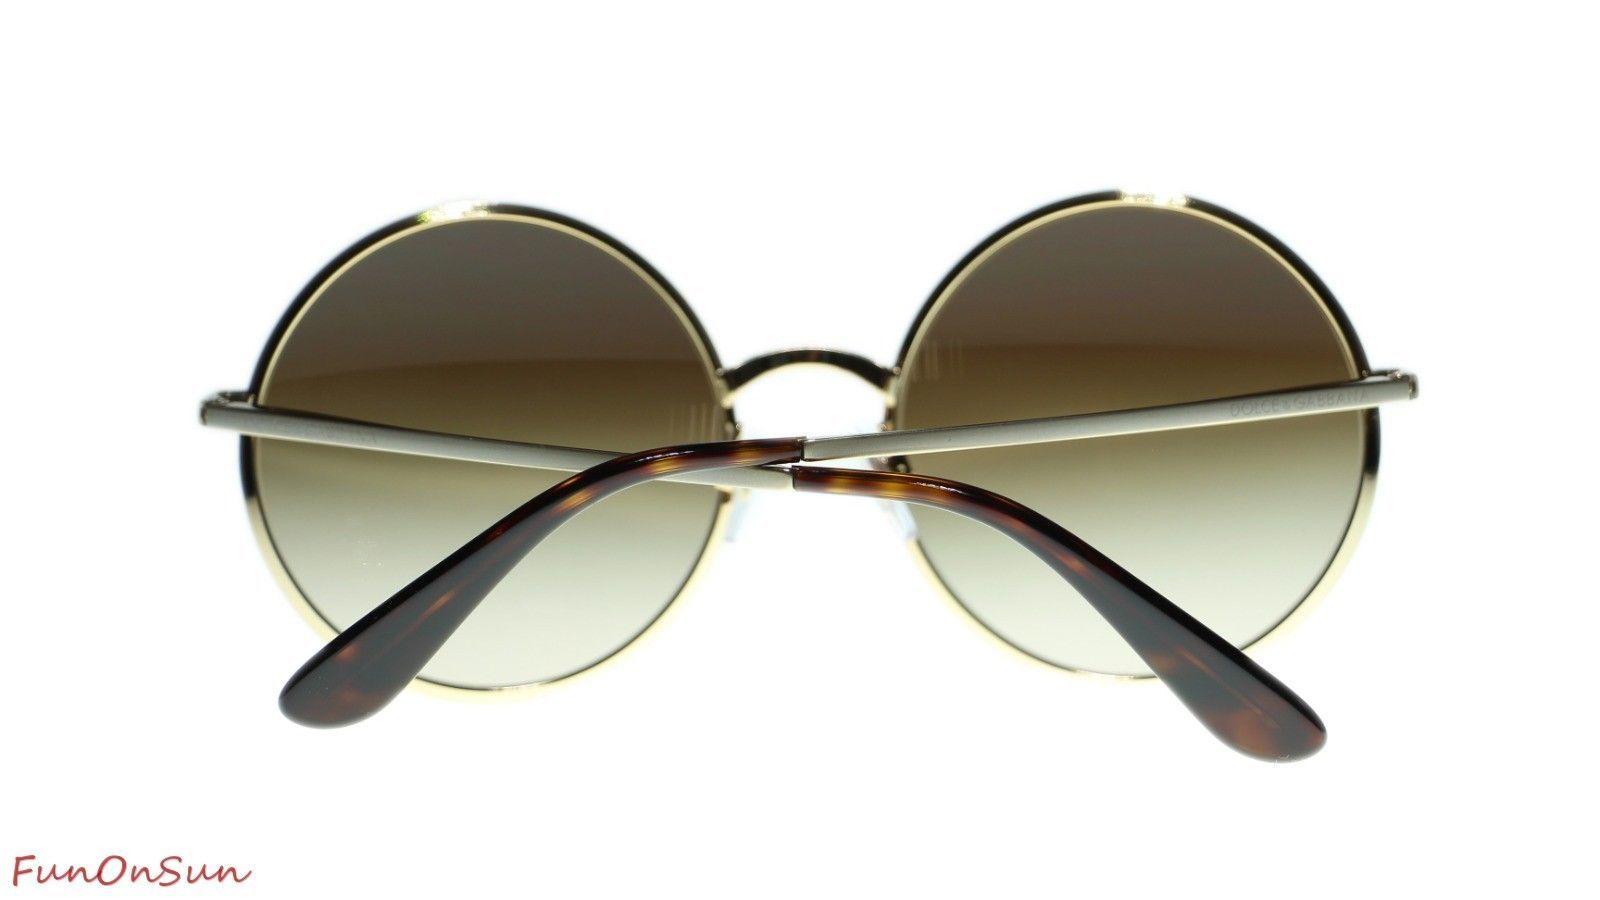 Dolce Gabbana Women Sunglasses DG2155 129713 Gold/Brown Gradient Lens 56mm